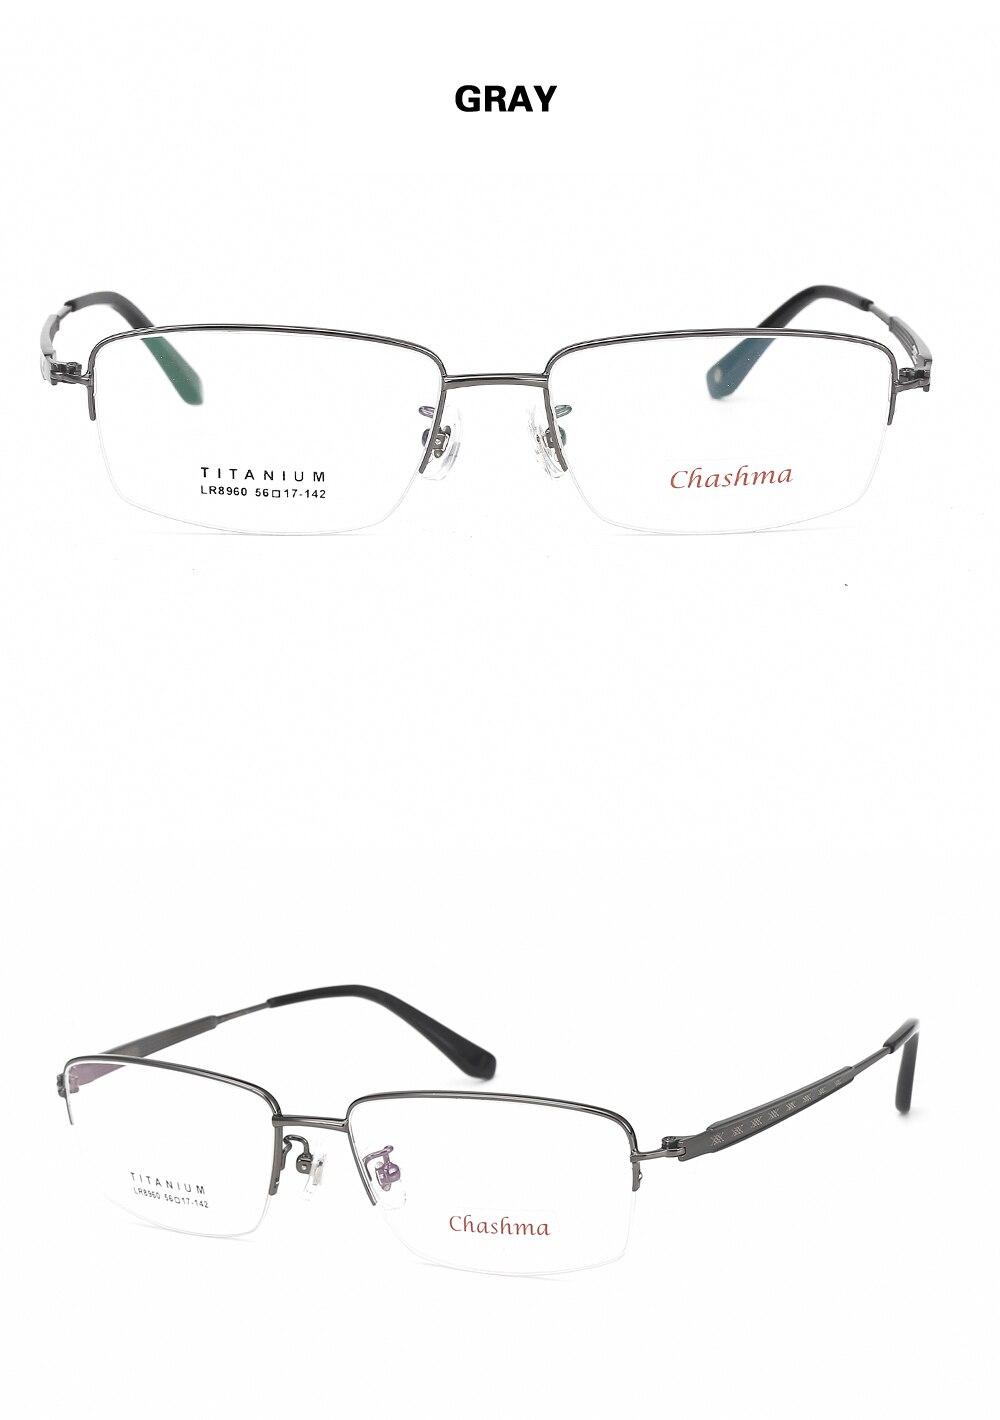 a2b0f2d602 ... Frame Men Titanium Half Rimmed Gafas Titanium Eye Glasses Frames for Men  Spectacles. xq Size 1 YS YS2 YS3 YS4 xijie. FQA for Prescription Lenses